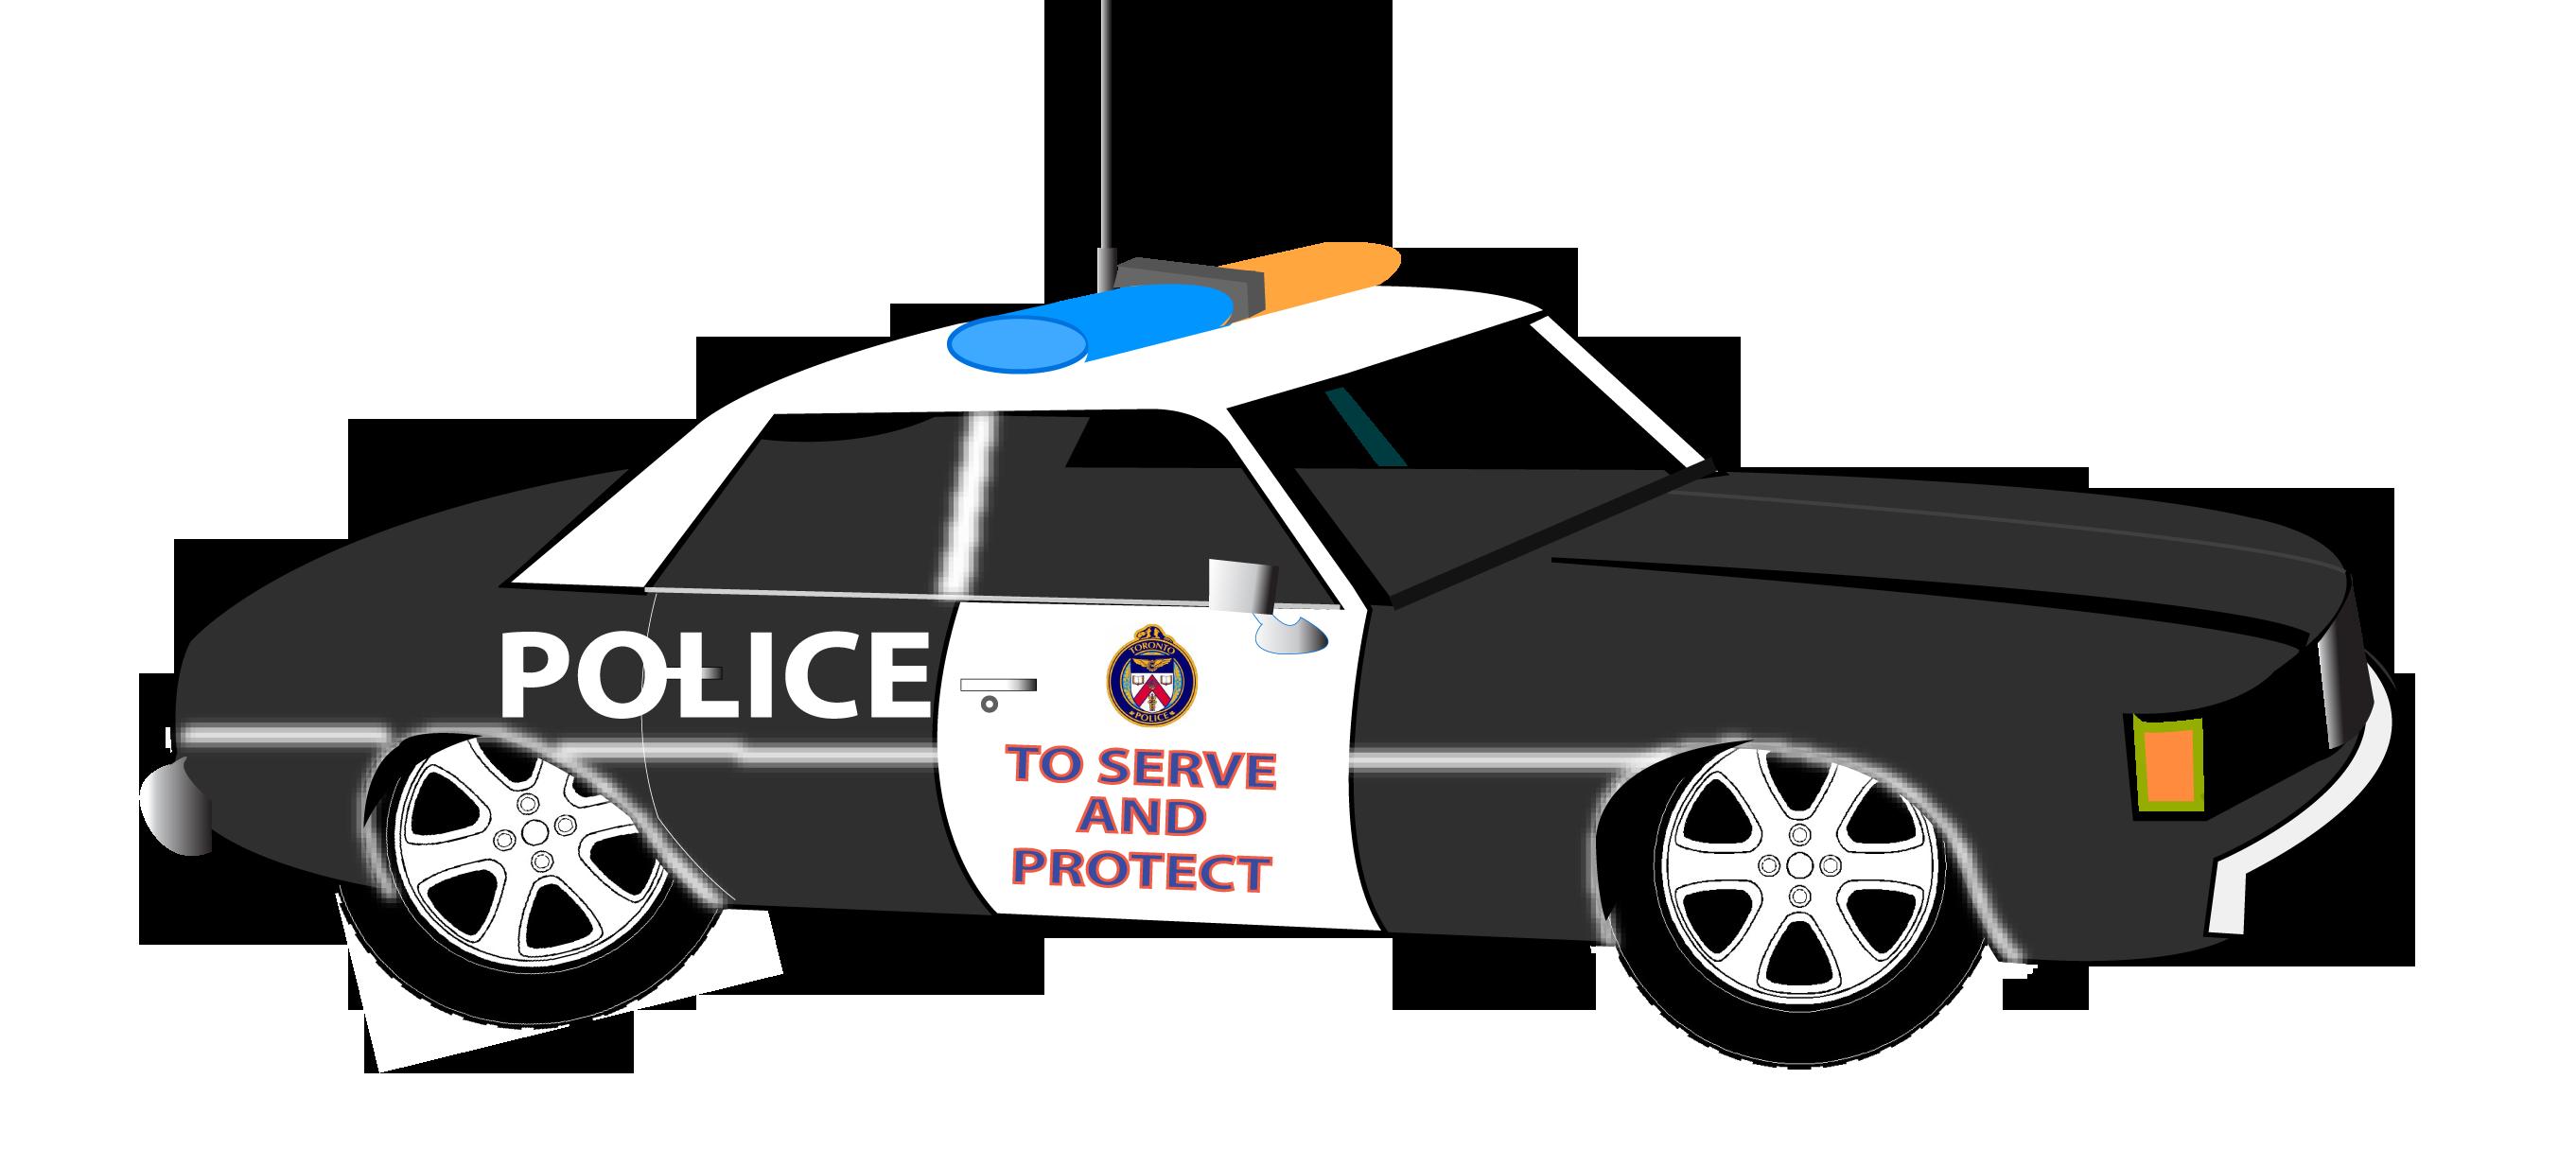 Clip art police clipart